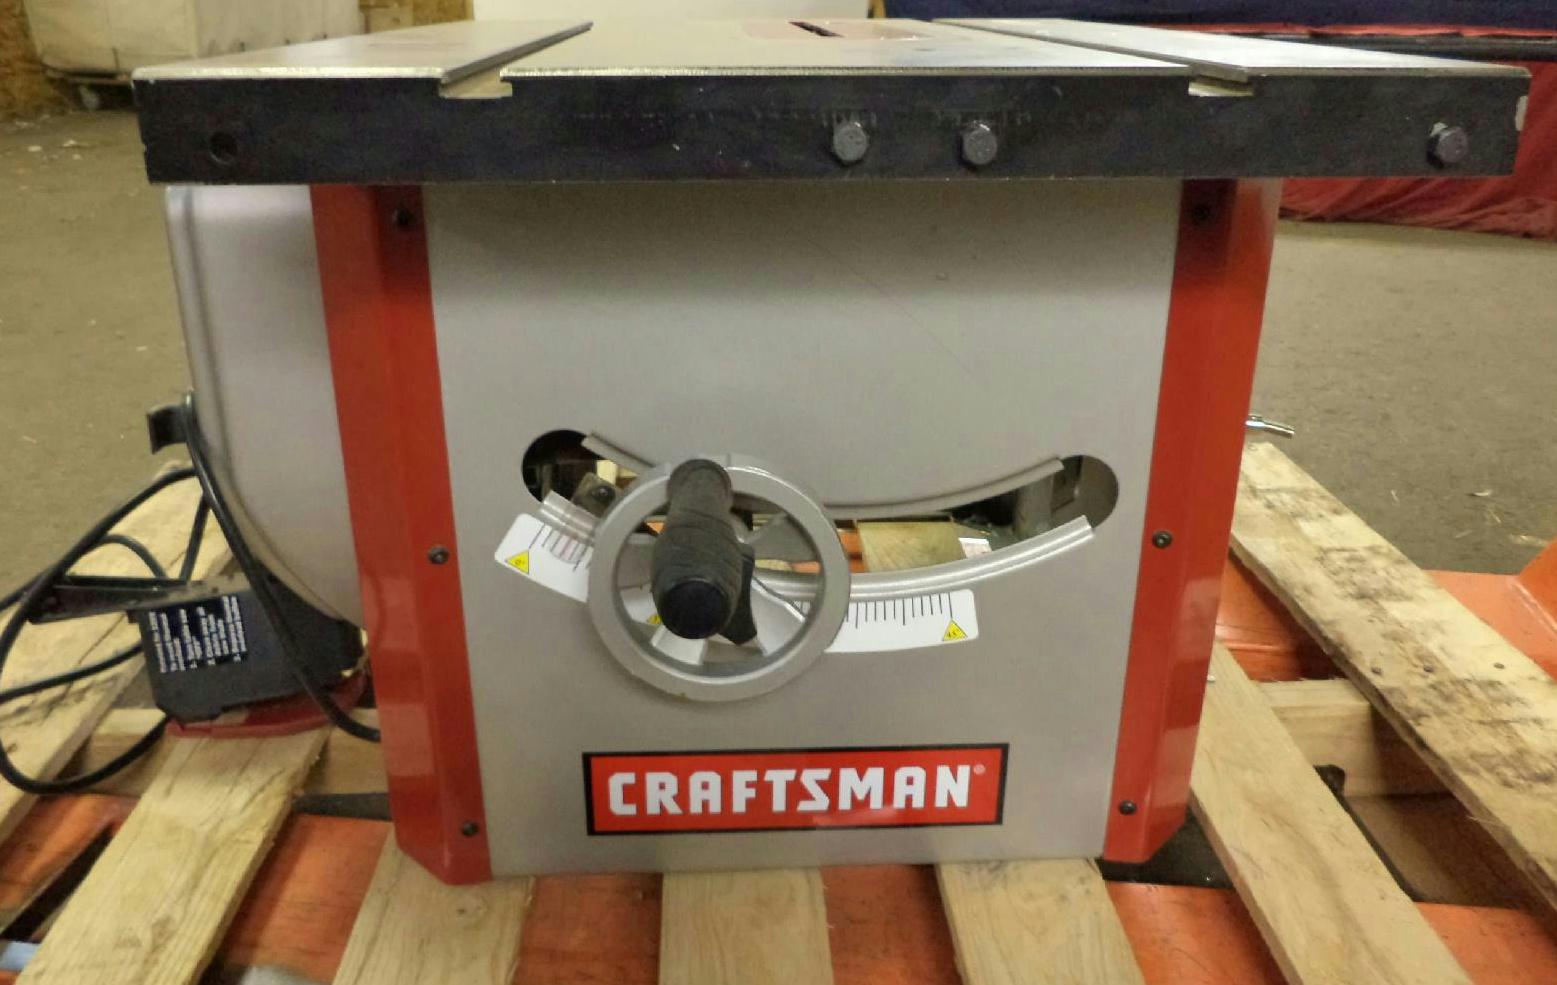 Pallet incomplete craftsman 10 inch contractors table saw for 10 inch craftsman table saw